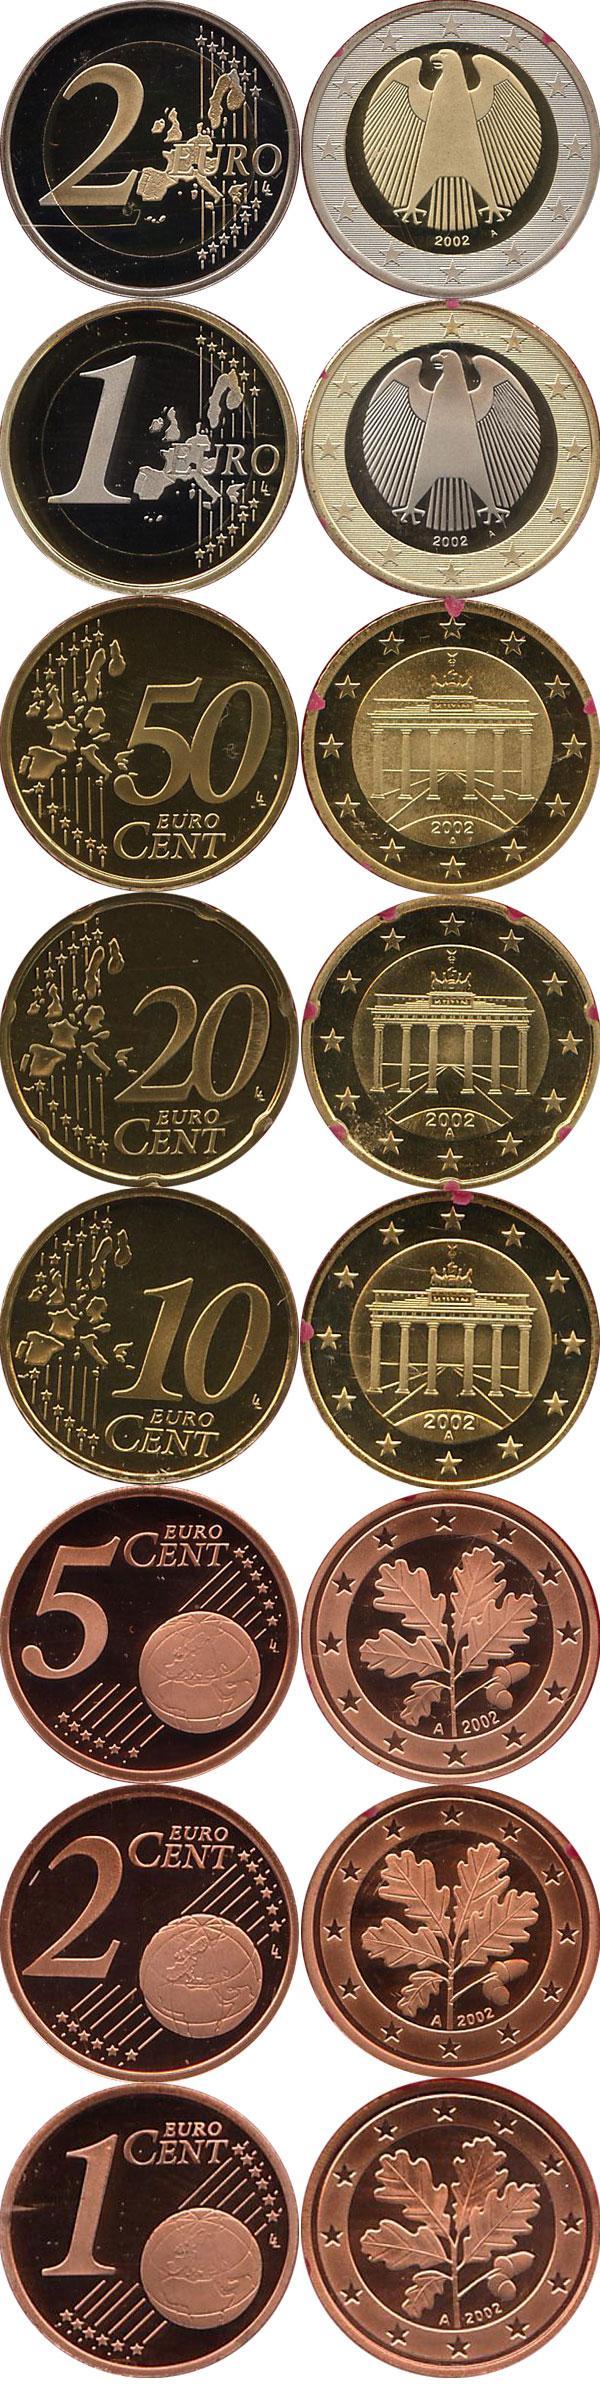 Каталог монет - Германия Выпуск 2002 года, Чеканка Берлина